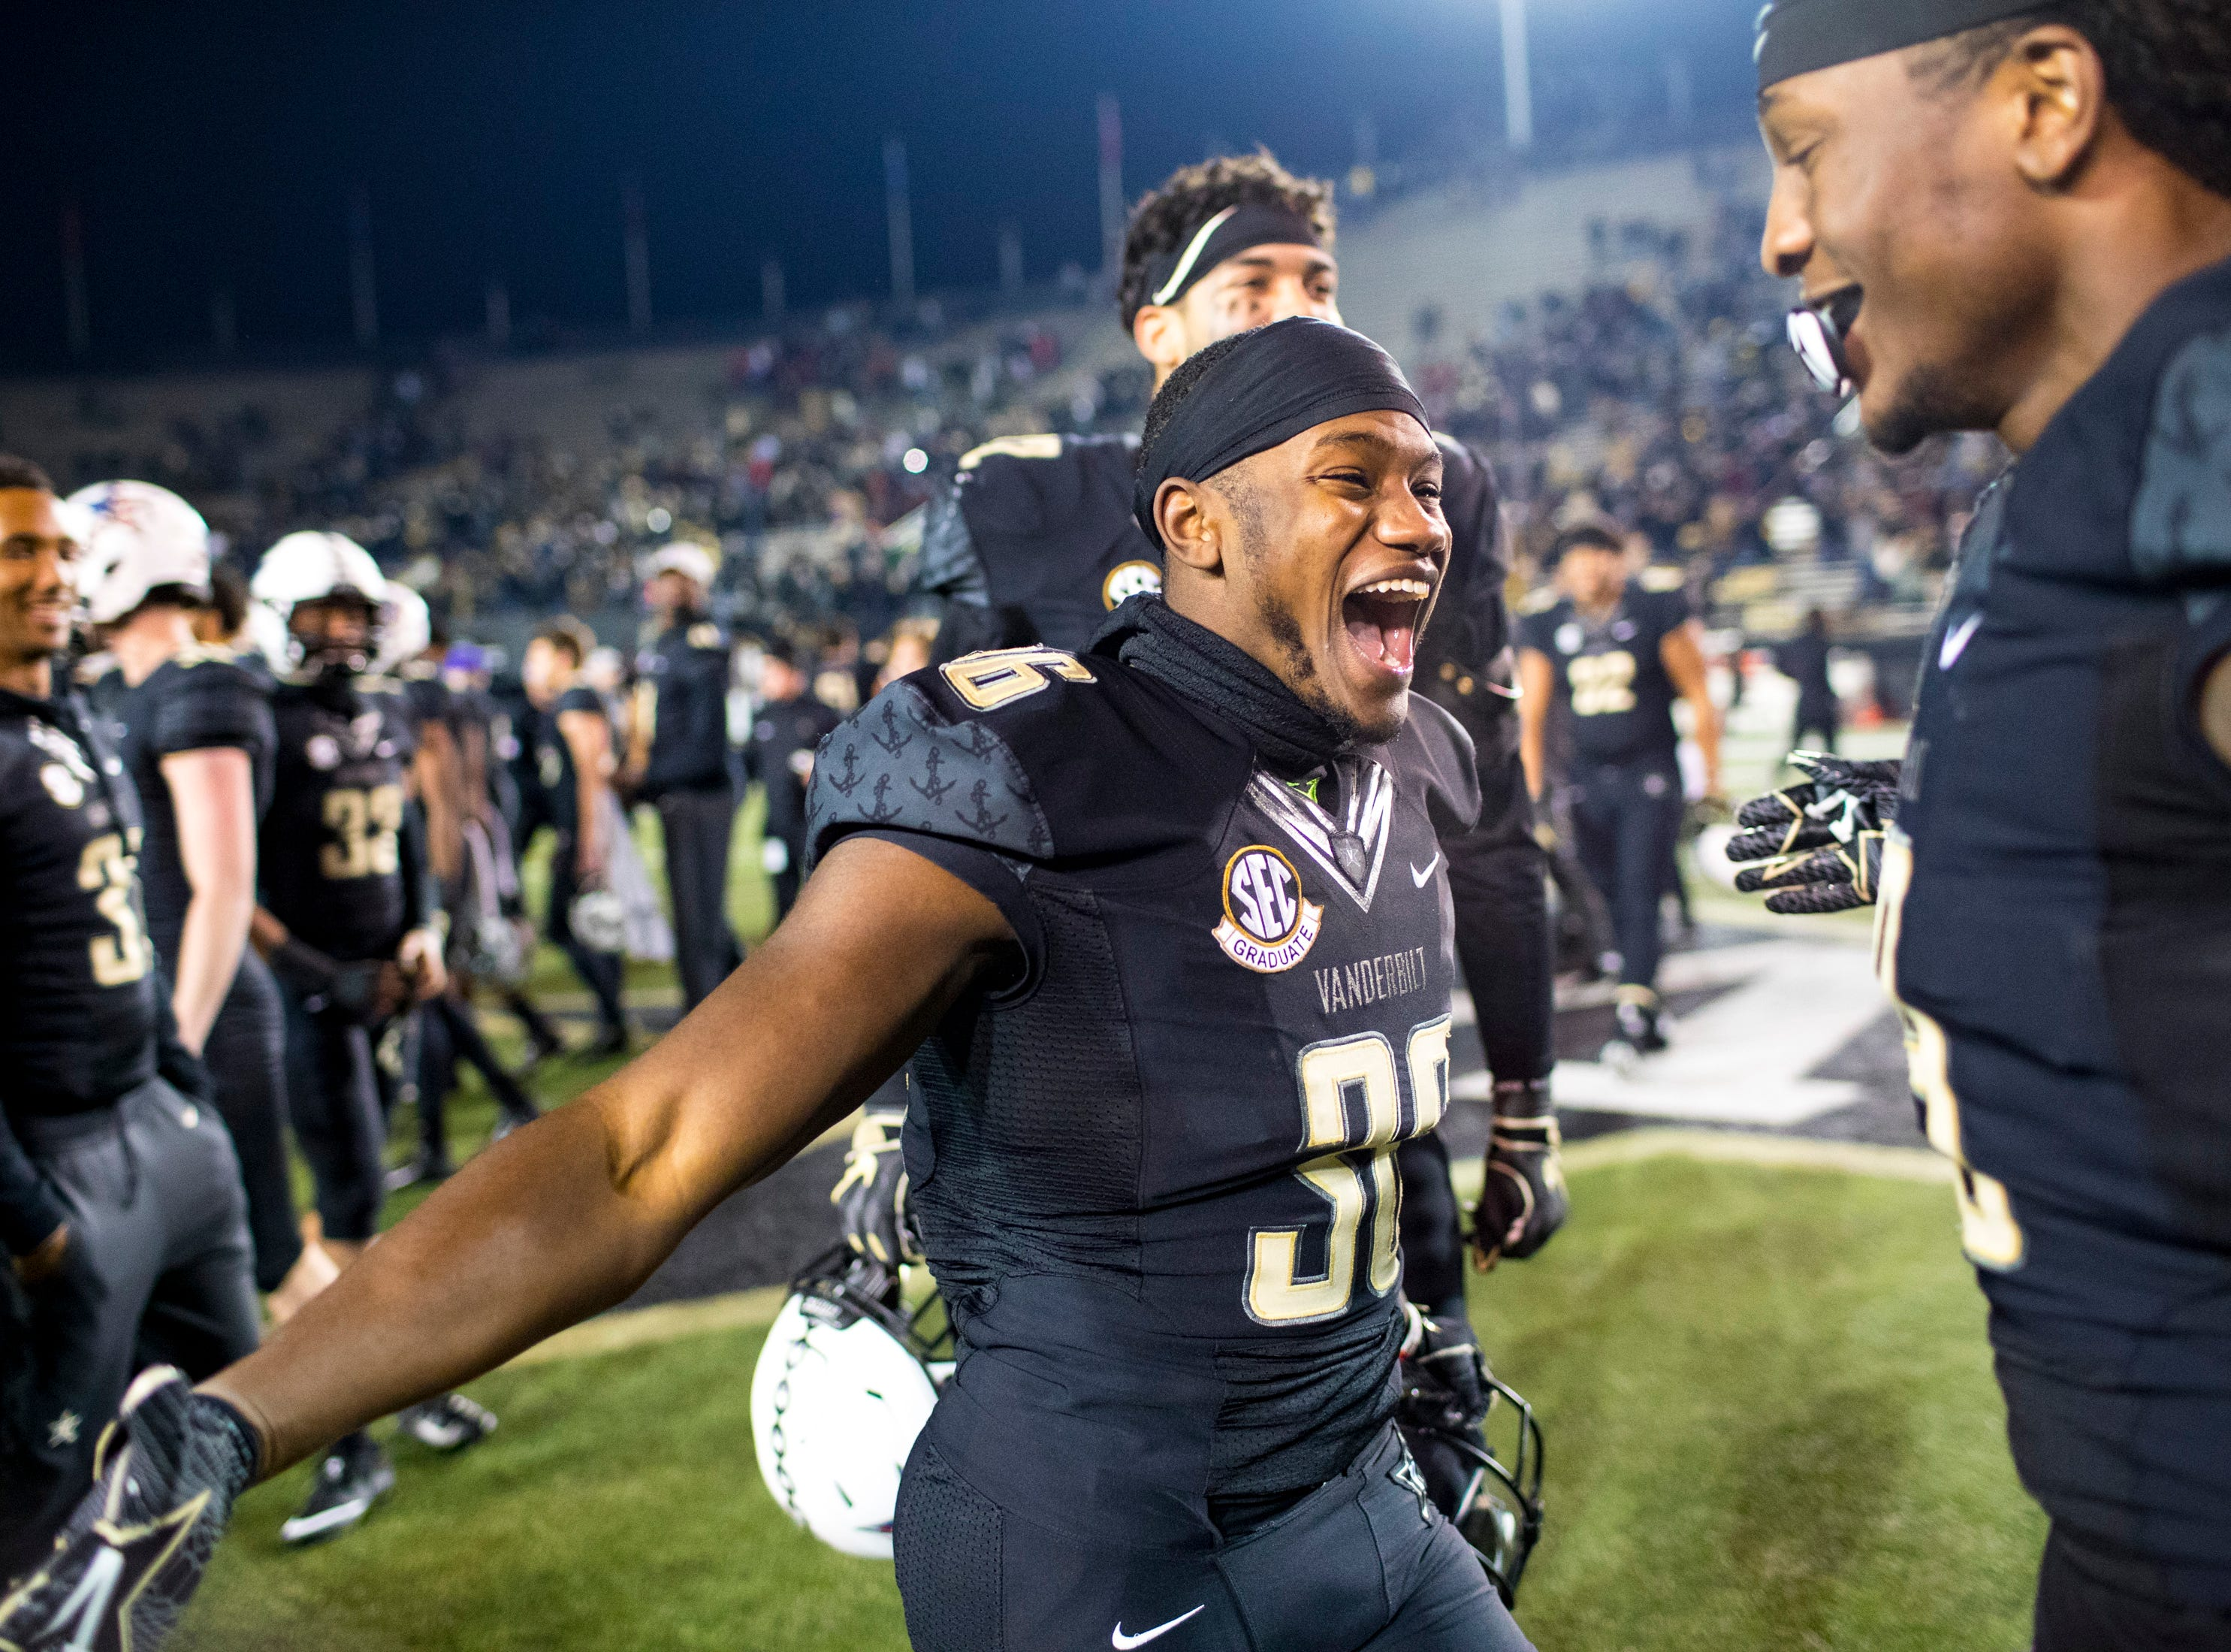 Vanderbilt wide receiver Trey Ellis (36) celebrates after Vanderbilt's game against Ole Miss at Vanderbilt Stadium in Nashville on Saturday, Nov. 17, 2018.